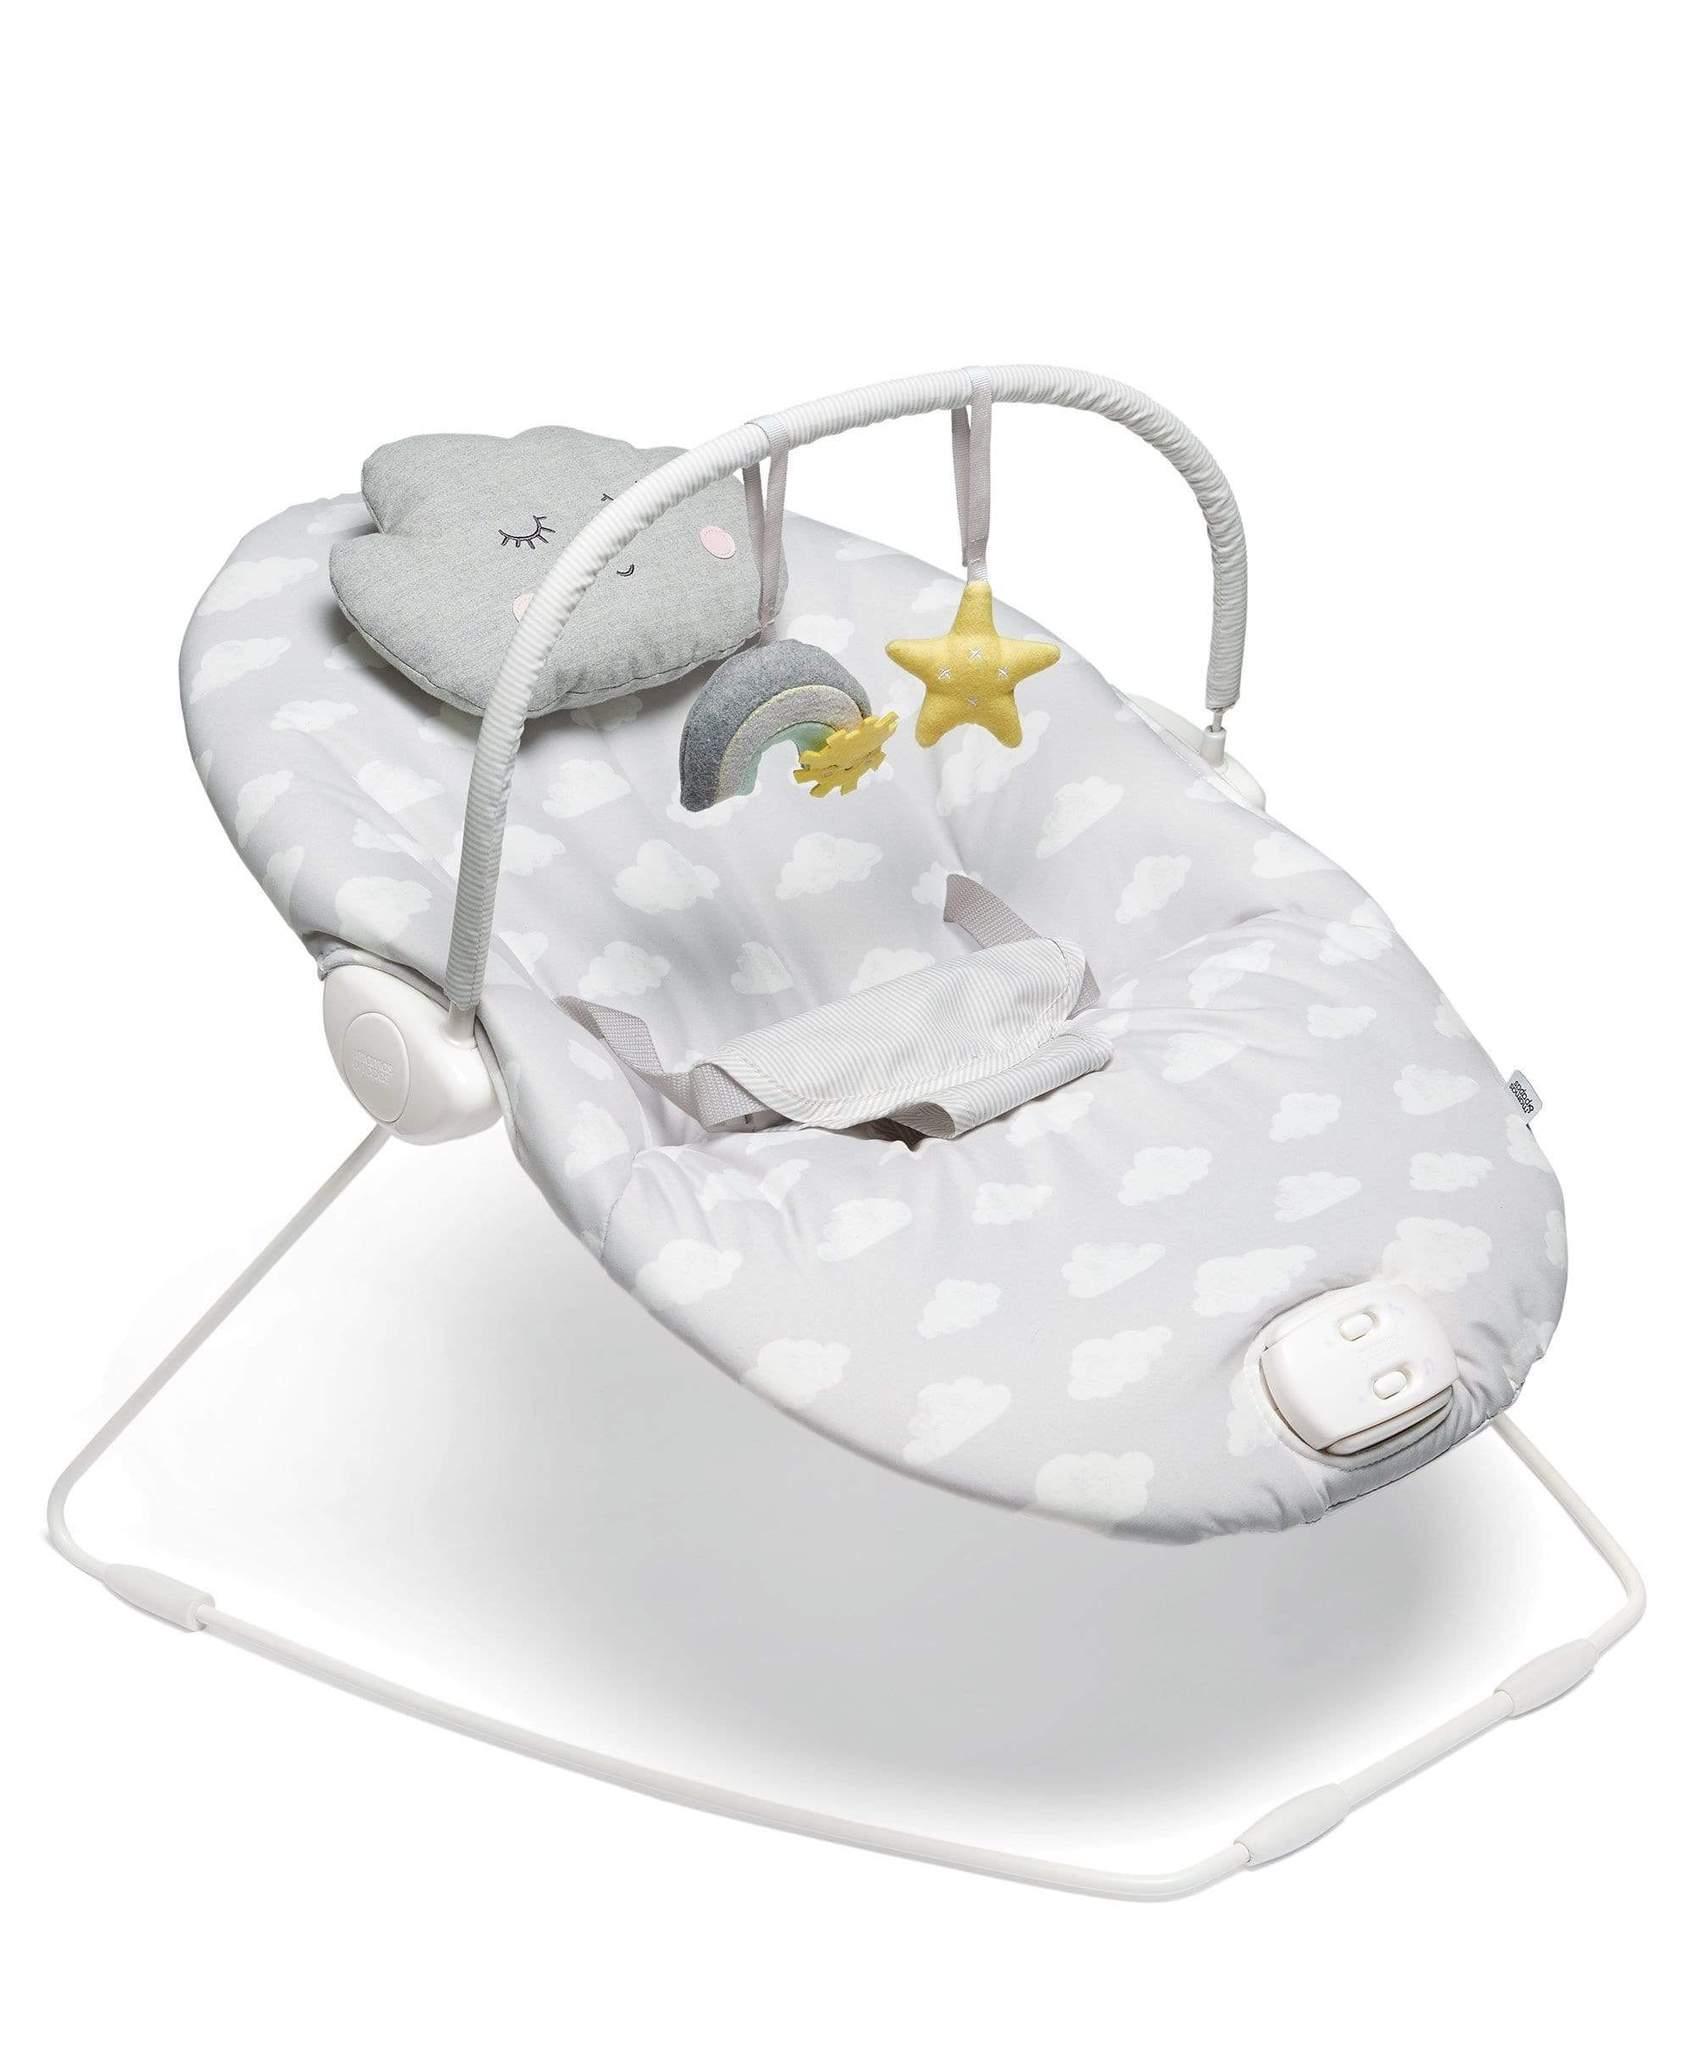 mamas-papas-bouncers-capella-bouncing-cradle-dream-upon-a-cloud-18930040144037_1024x1024@2x (1)